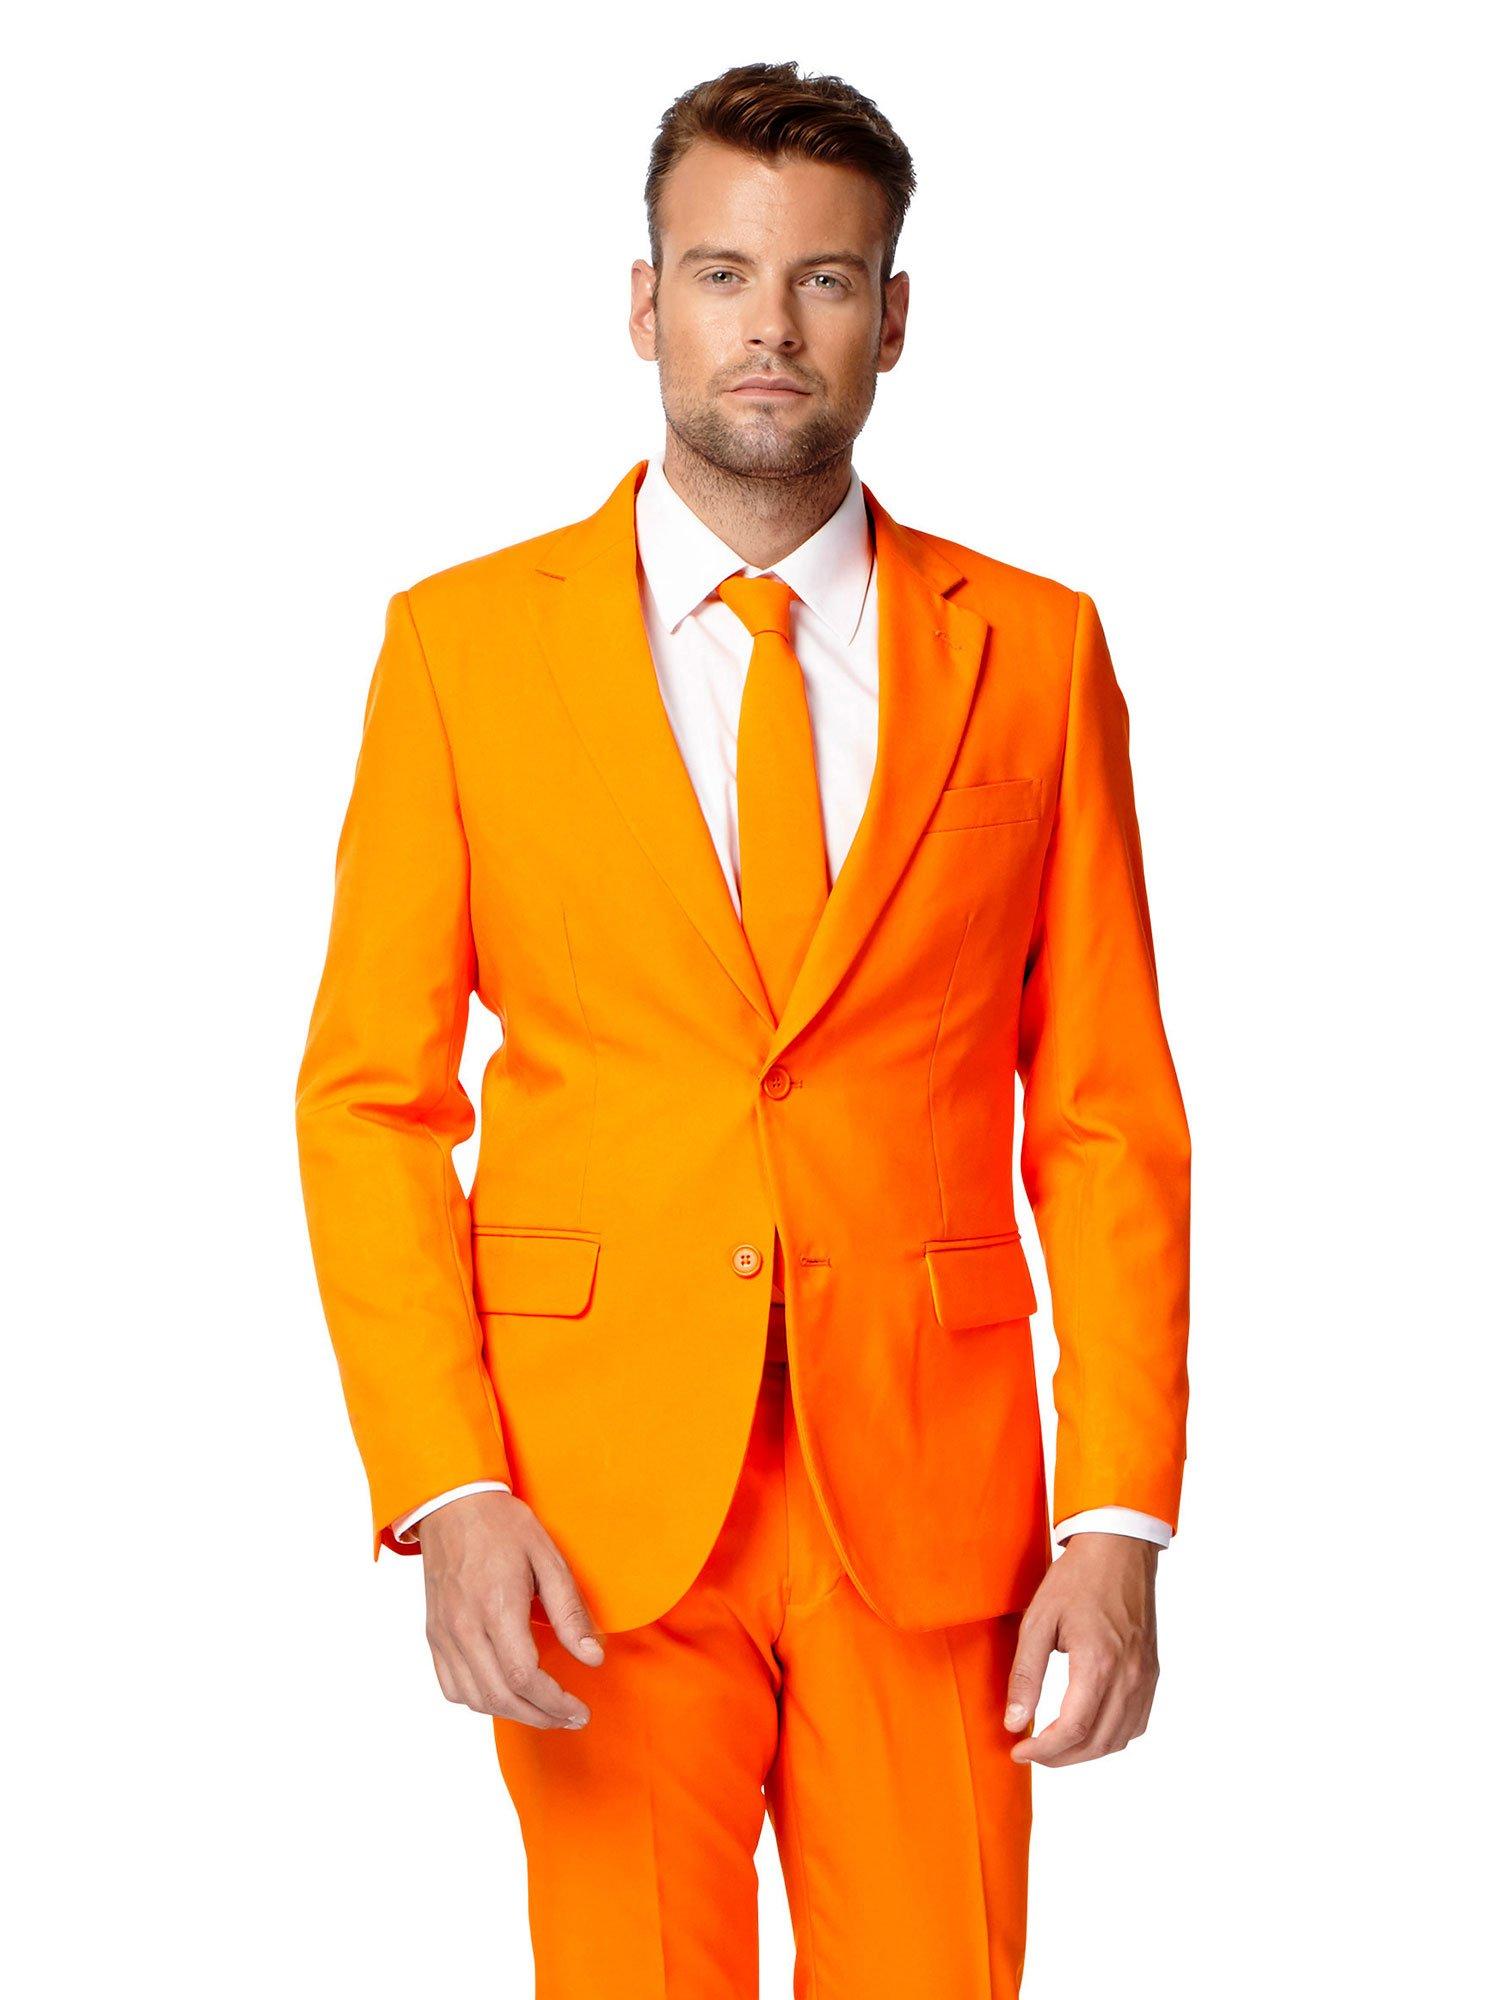 Opposuits Men's Party Costume Suit, Orange, 42